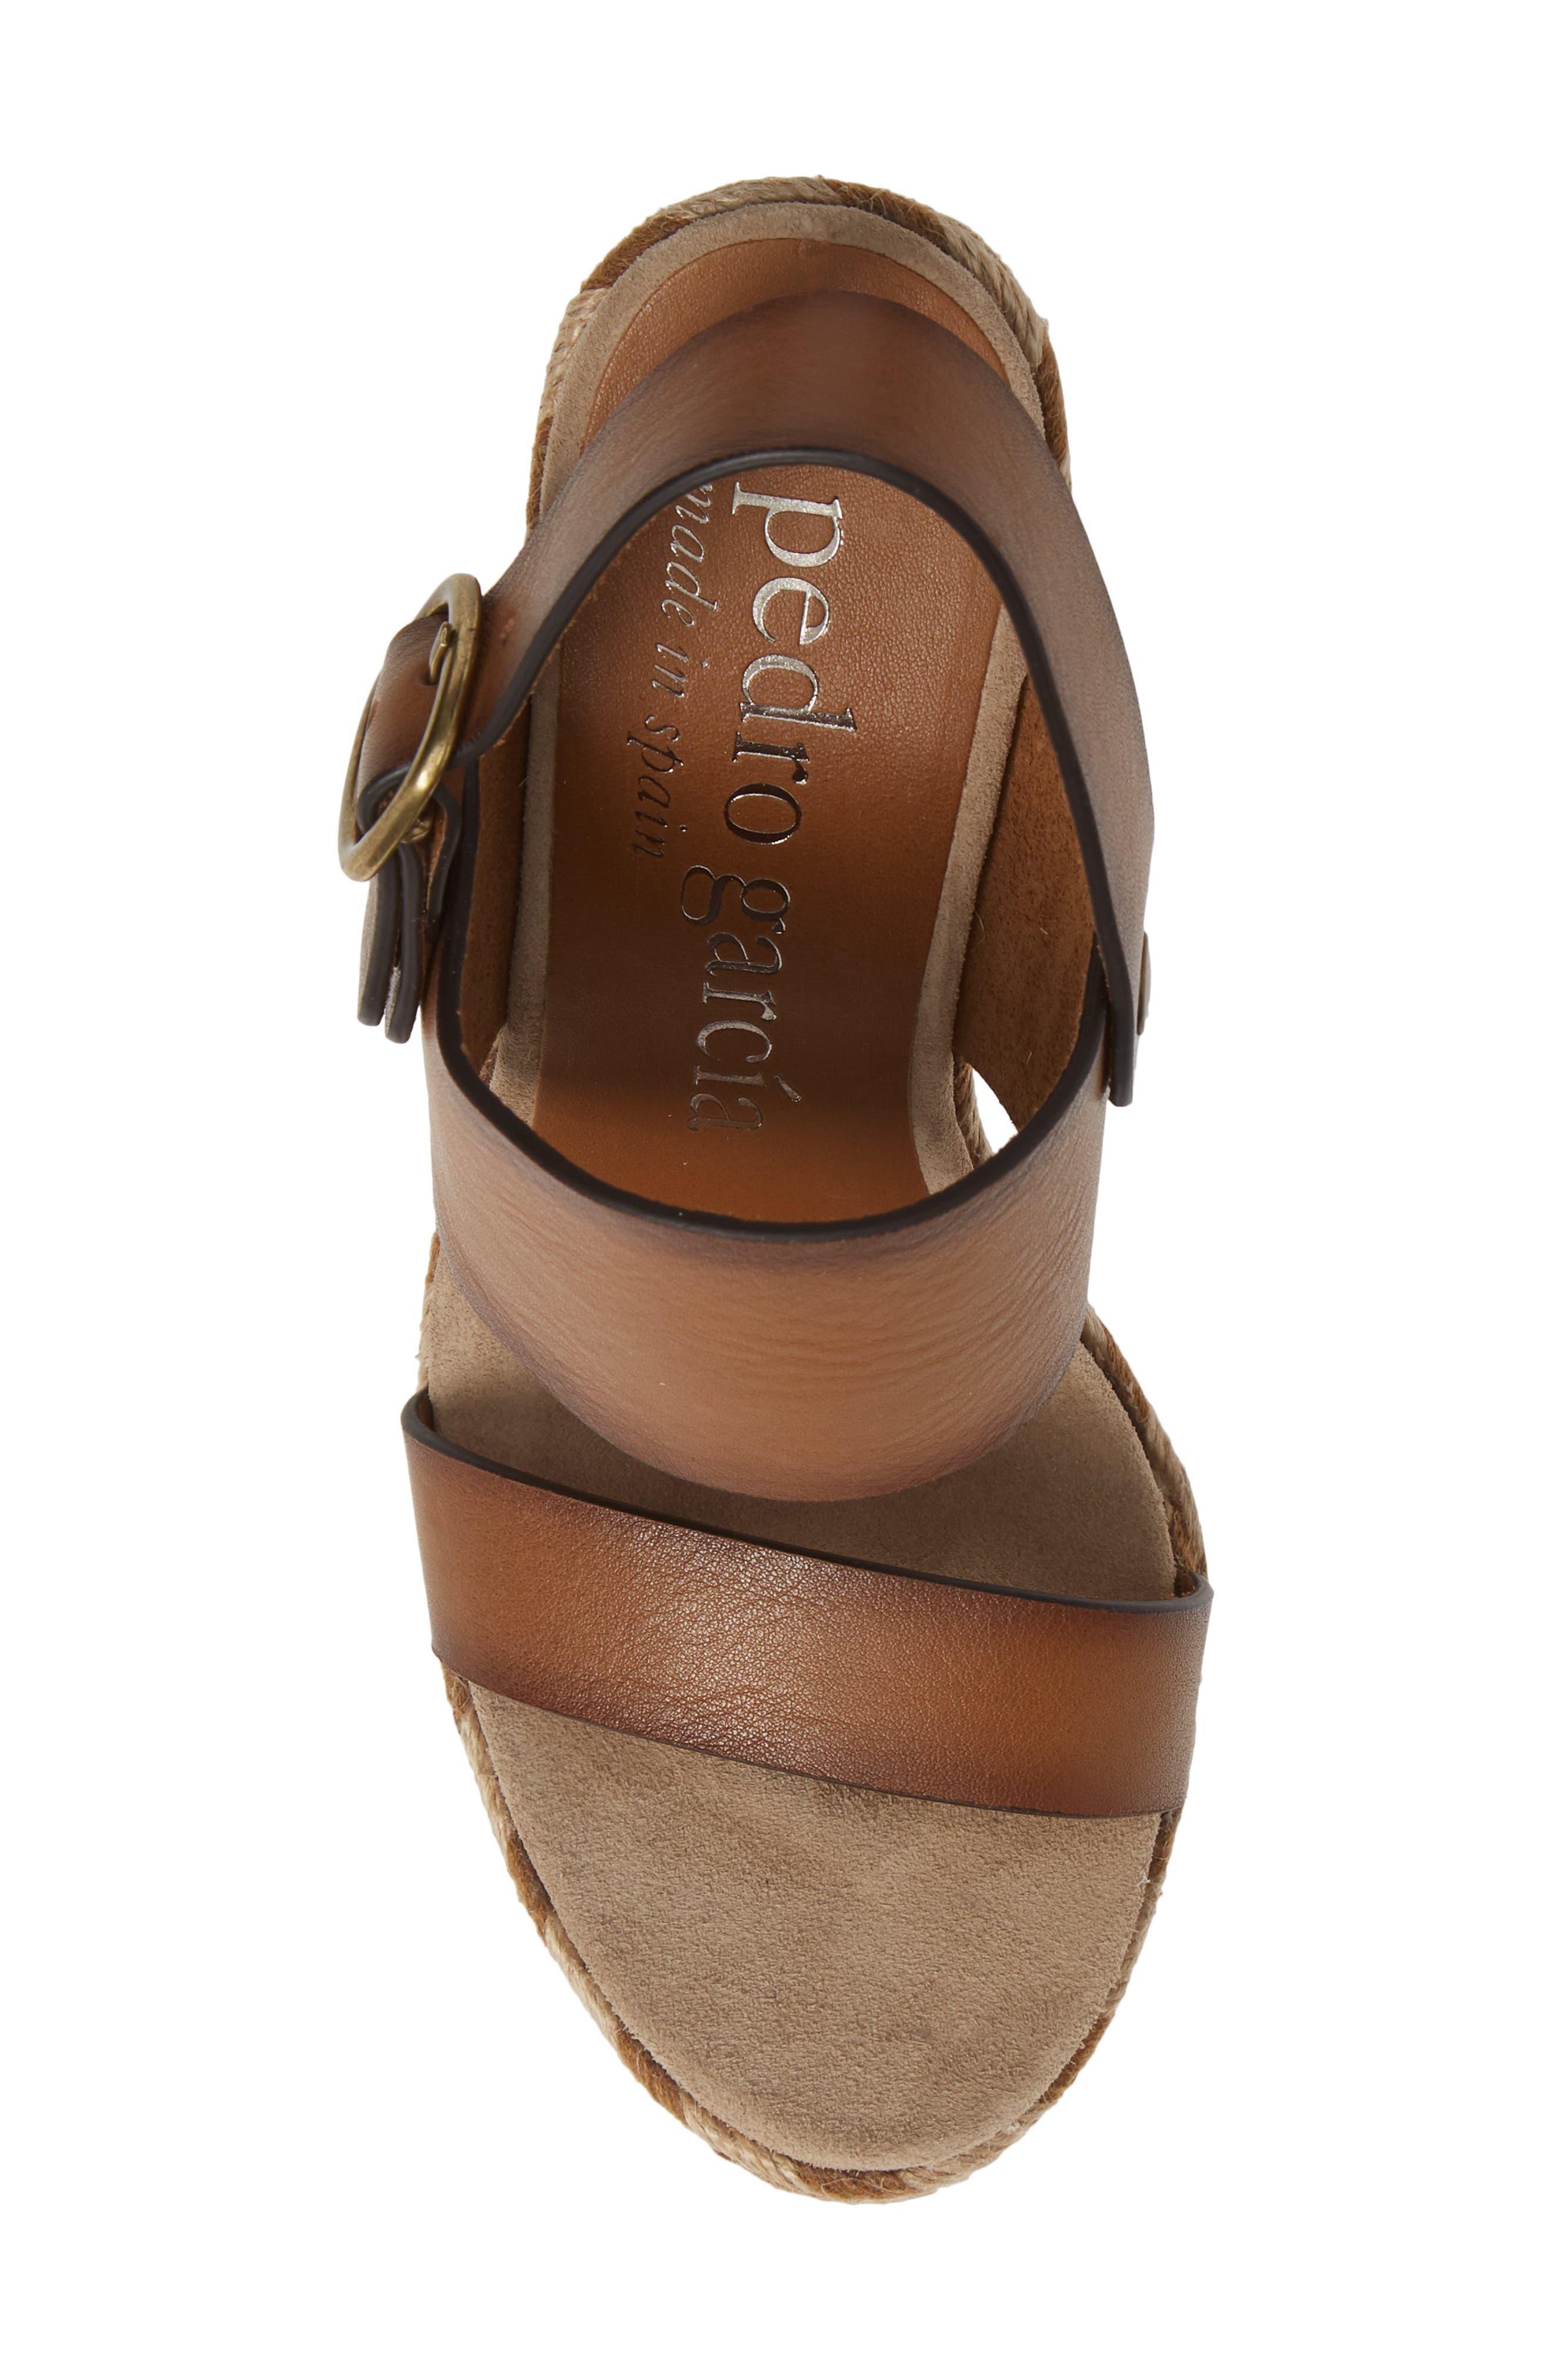 Tait Woven Wedge Sandal,                             Alternate thumbnail 5, color,                             CIGAR VACCHETTA